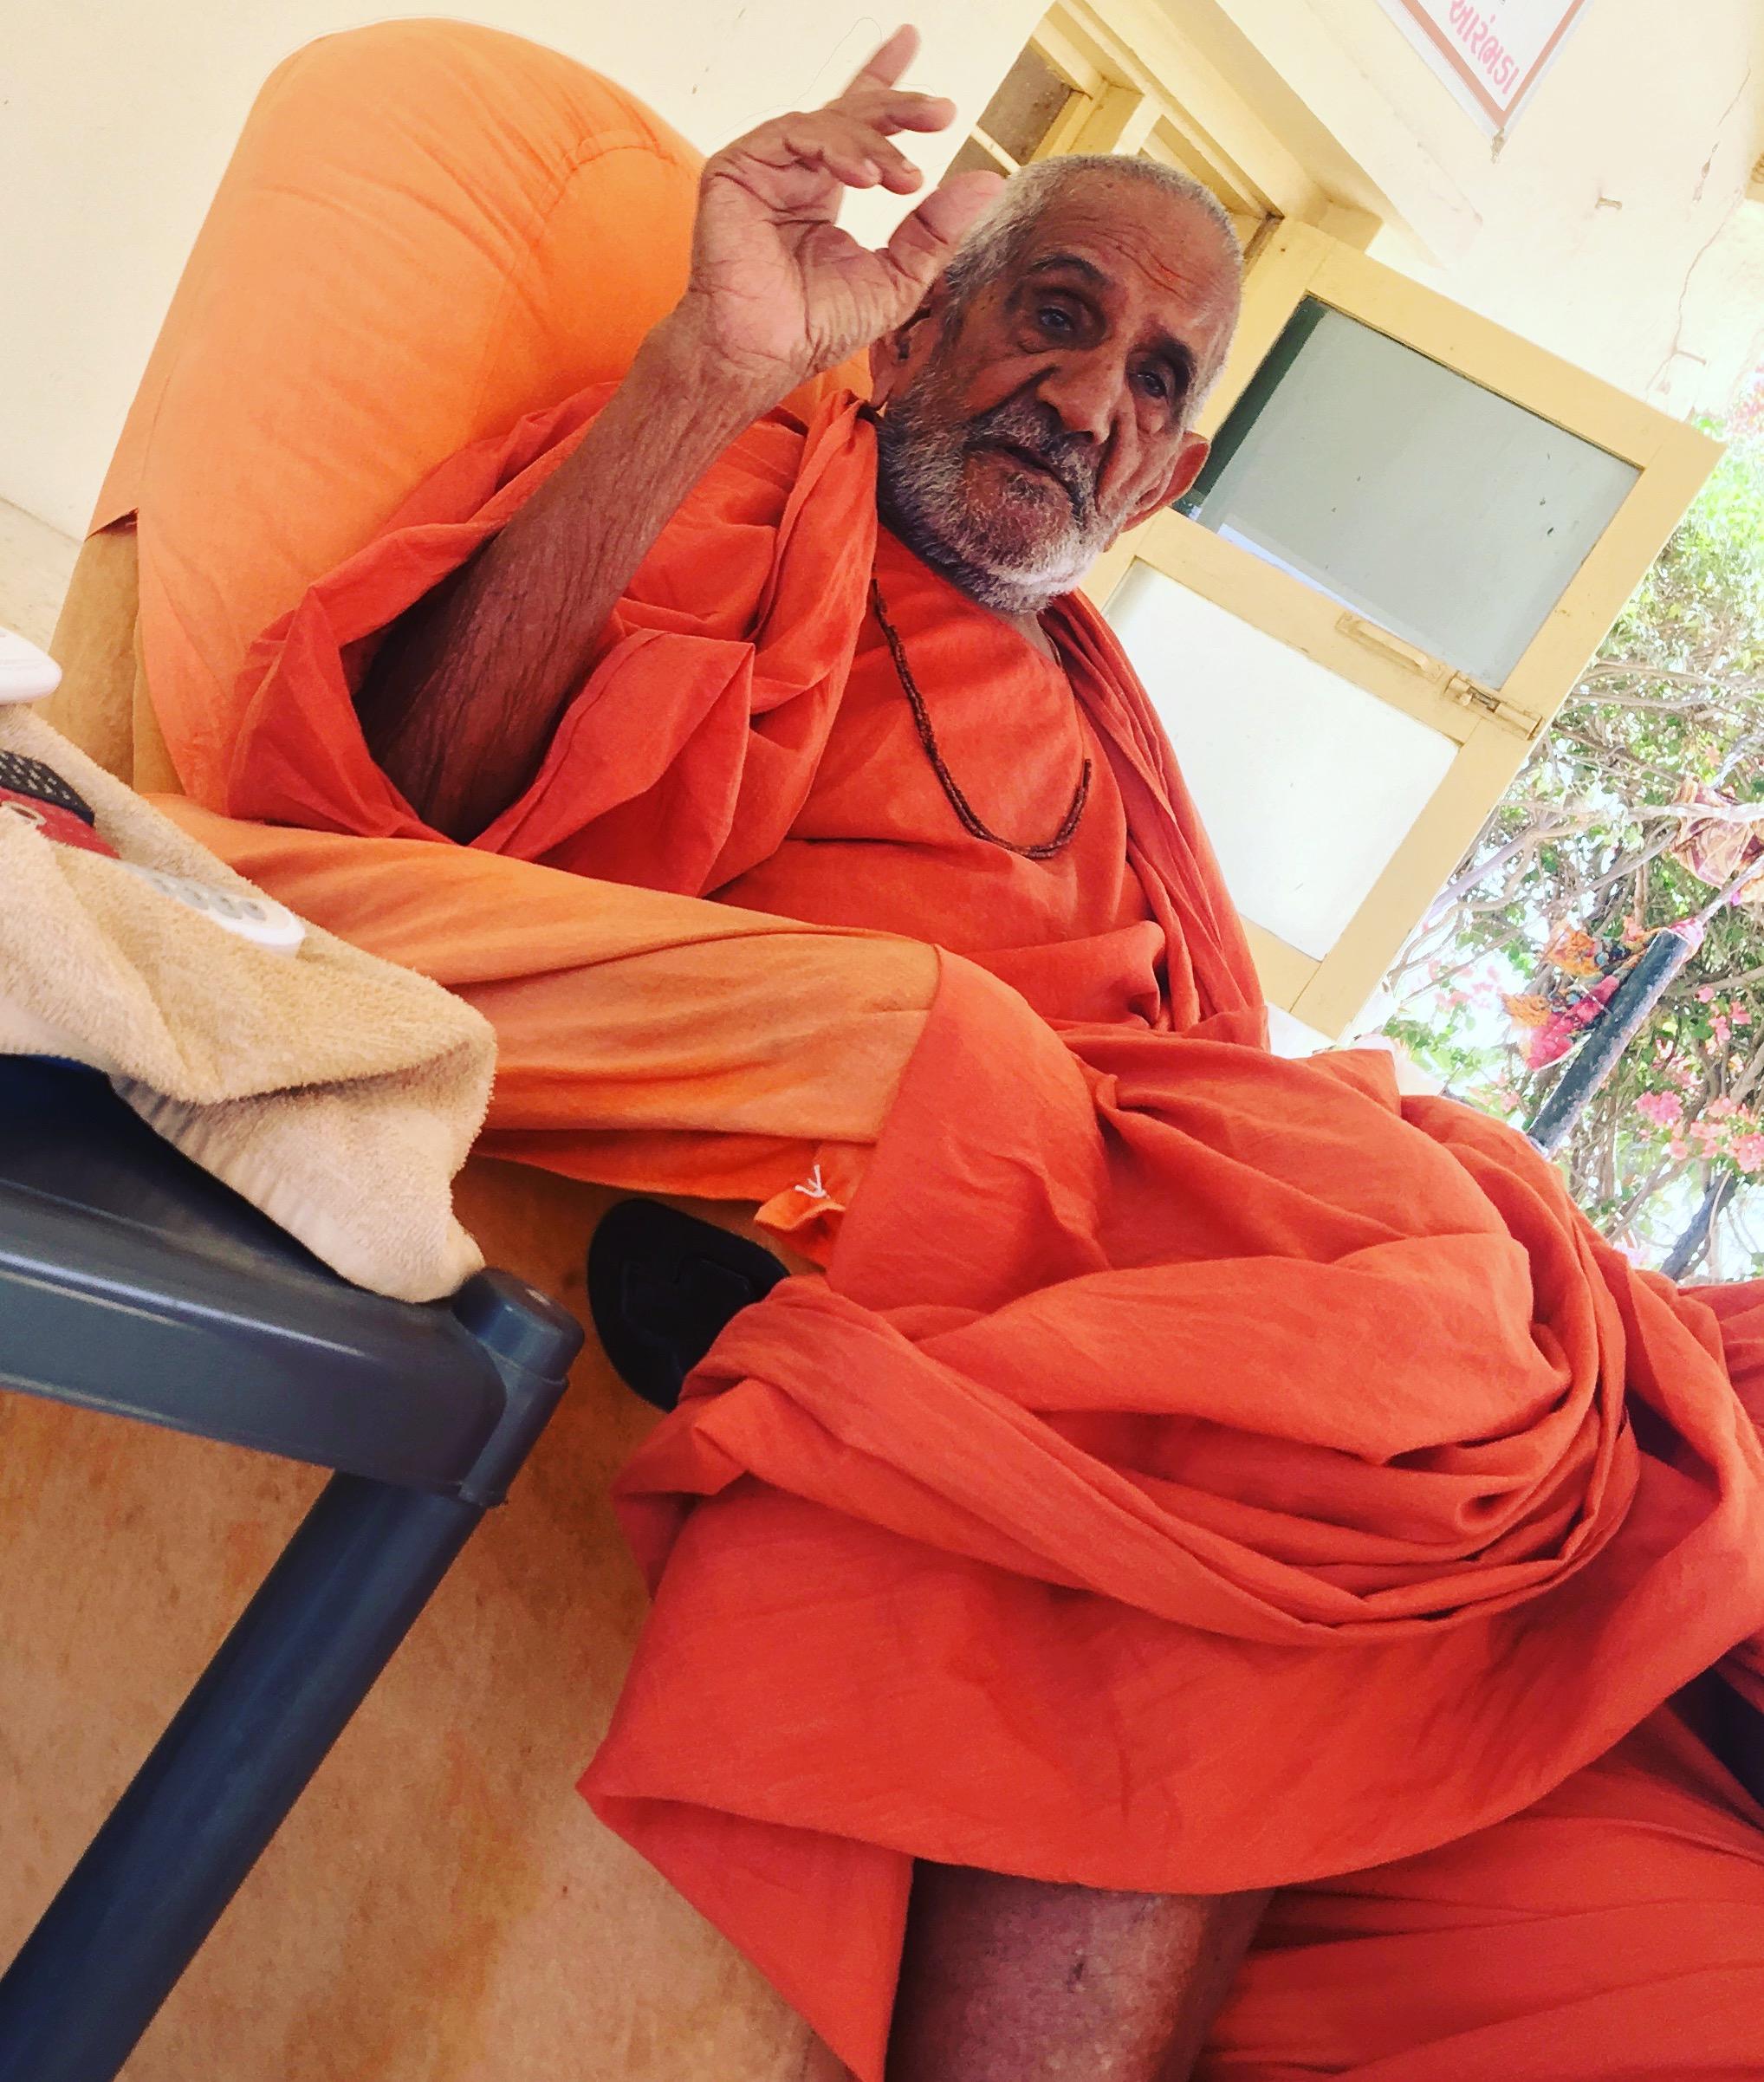 Narayanprasaddasji Swami - Wikipedia